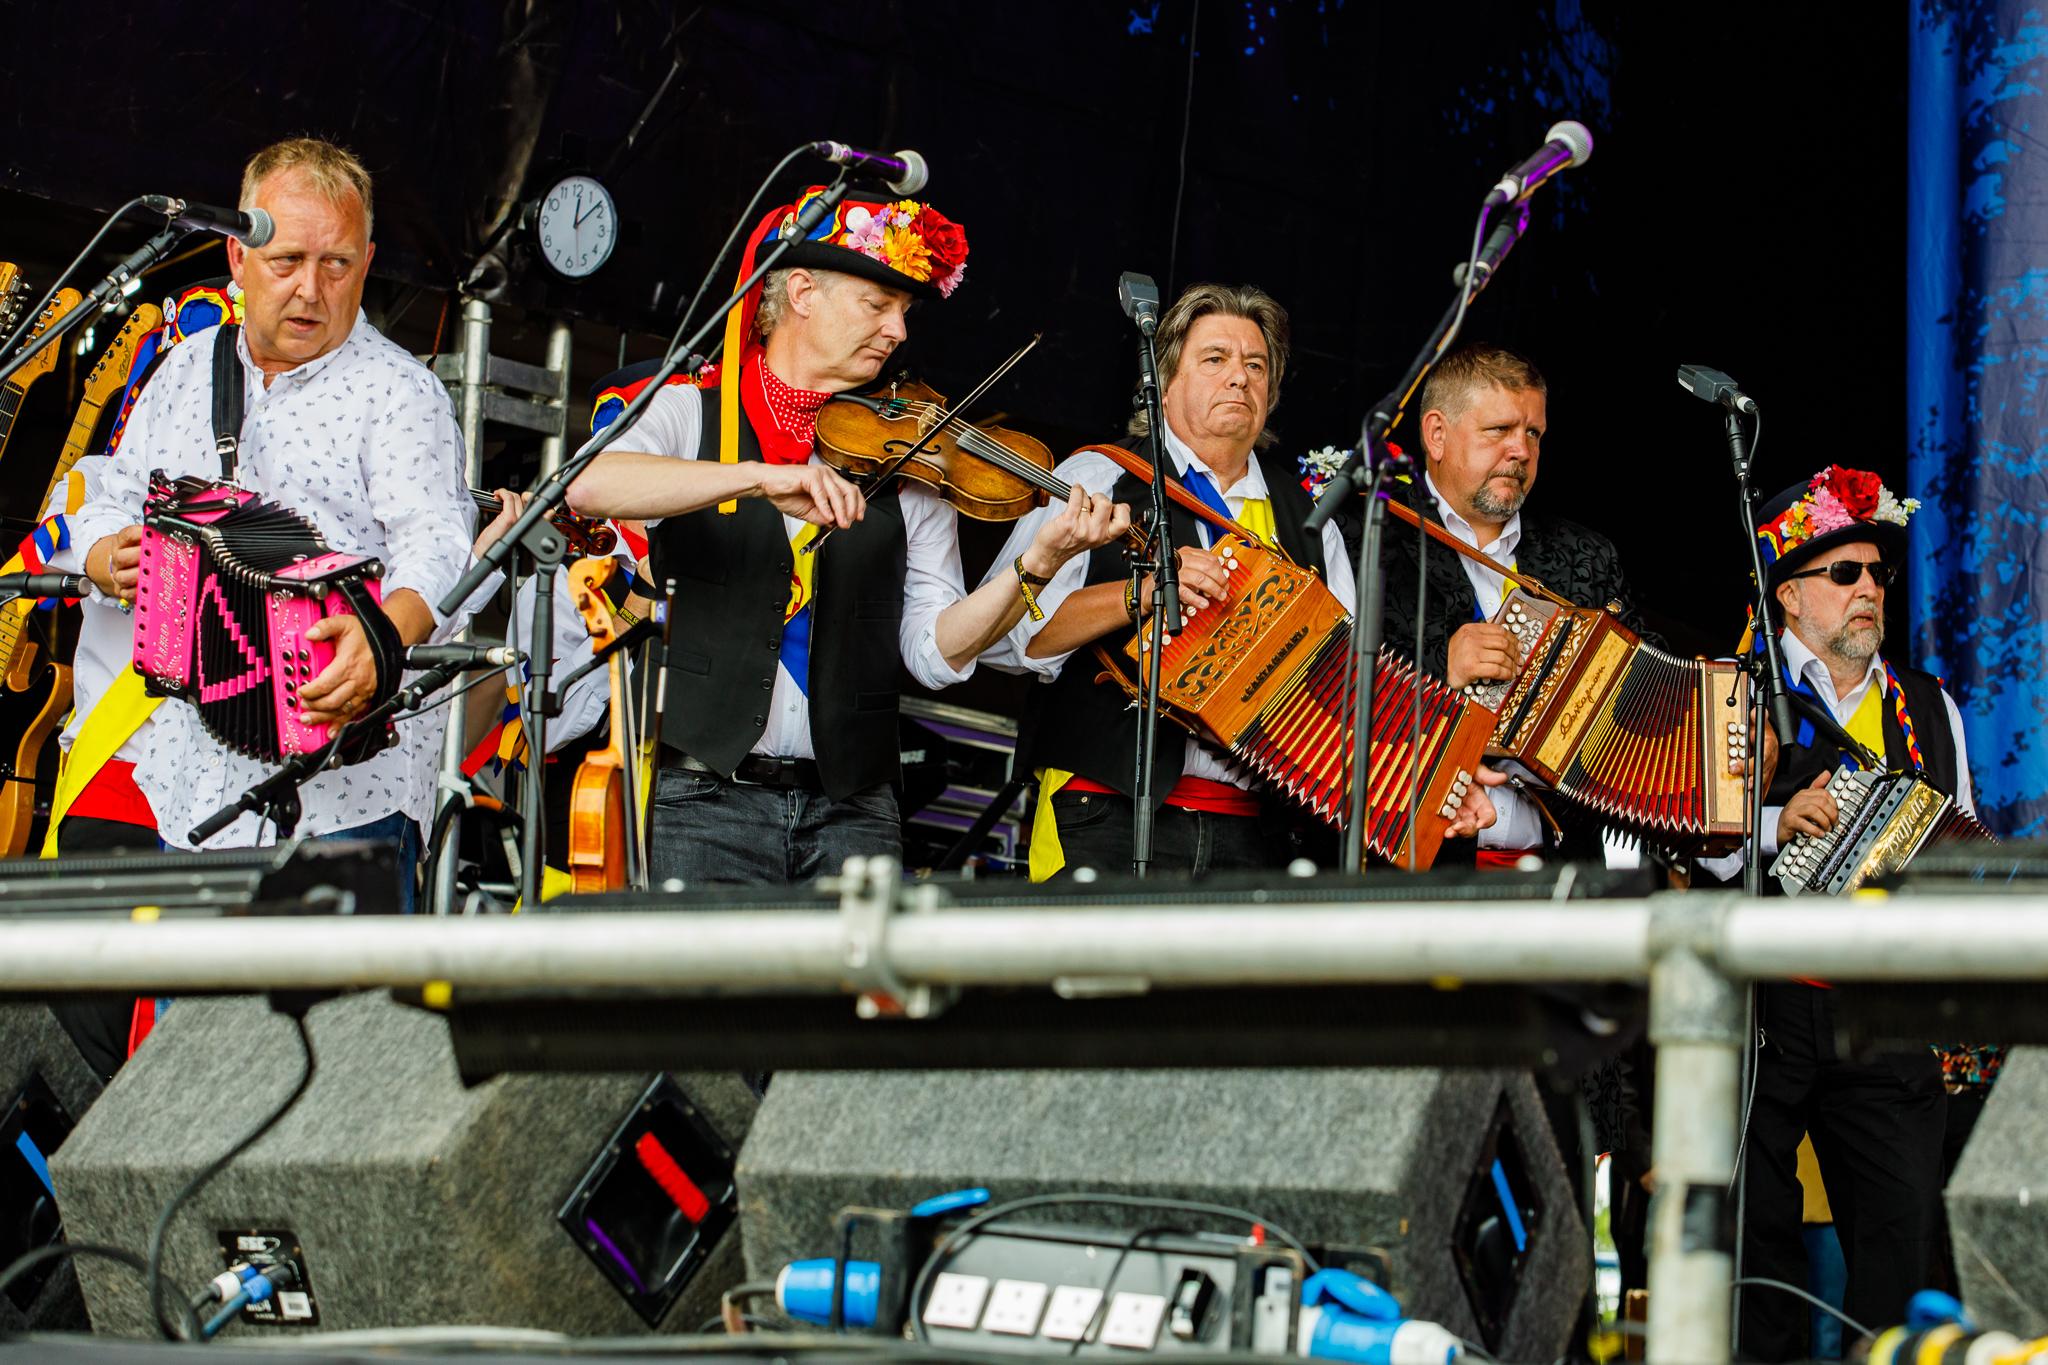 Morris On at Fairport's Cropredy Convention (photo by Matt Condon / @arcane93)